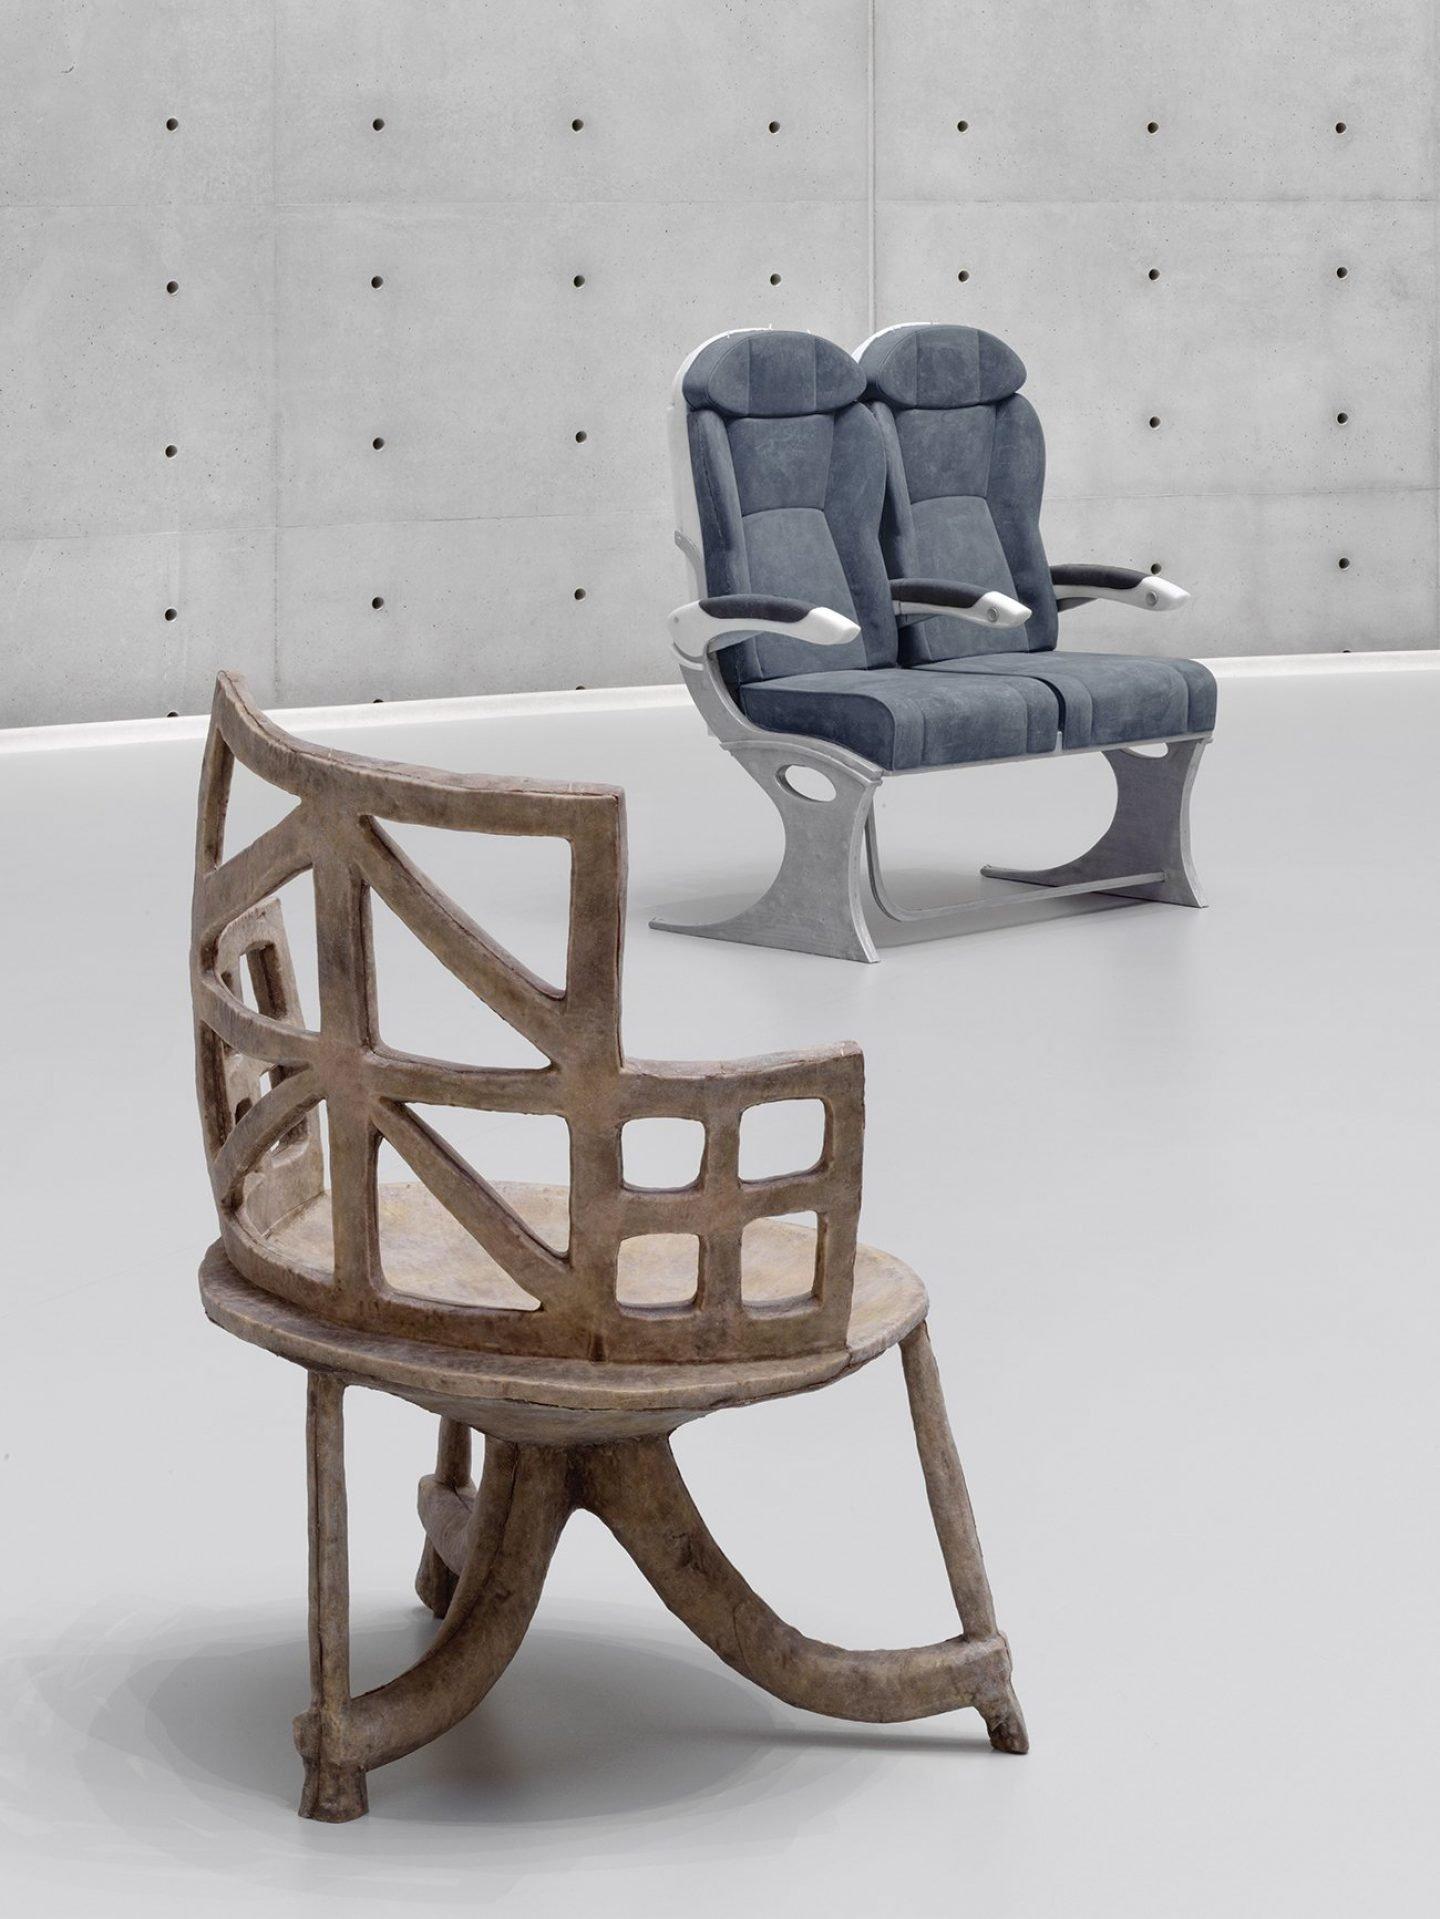 IGNANT-Art-Urs-Fischer-Pinault-Collection-02